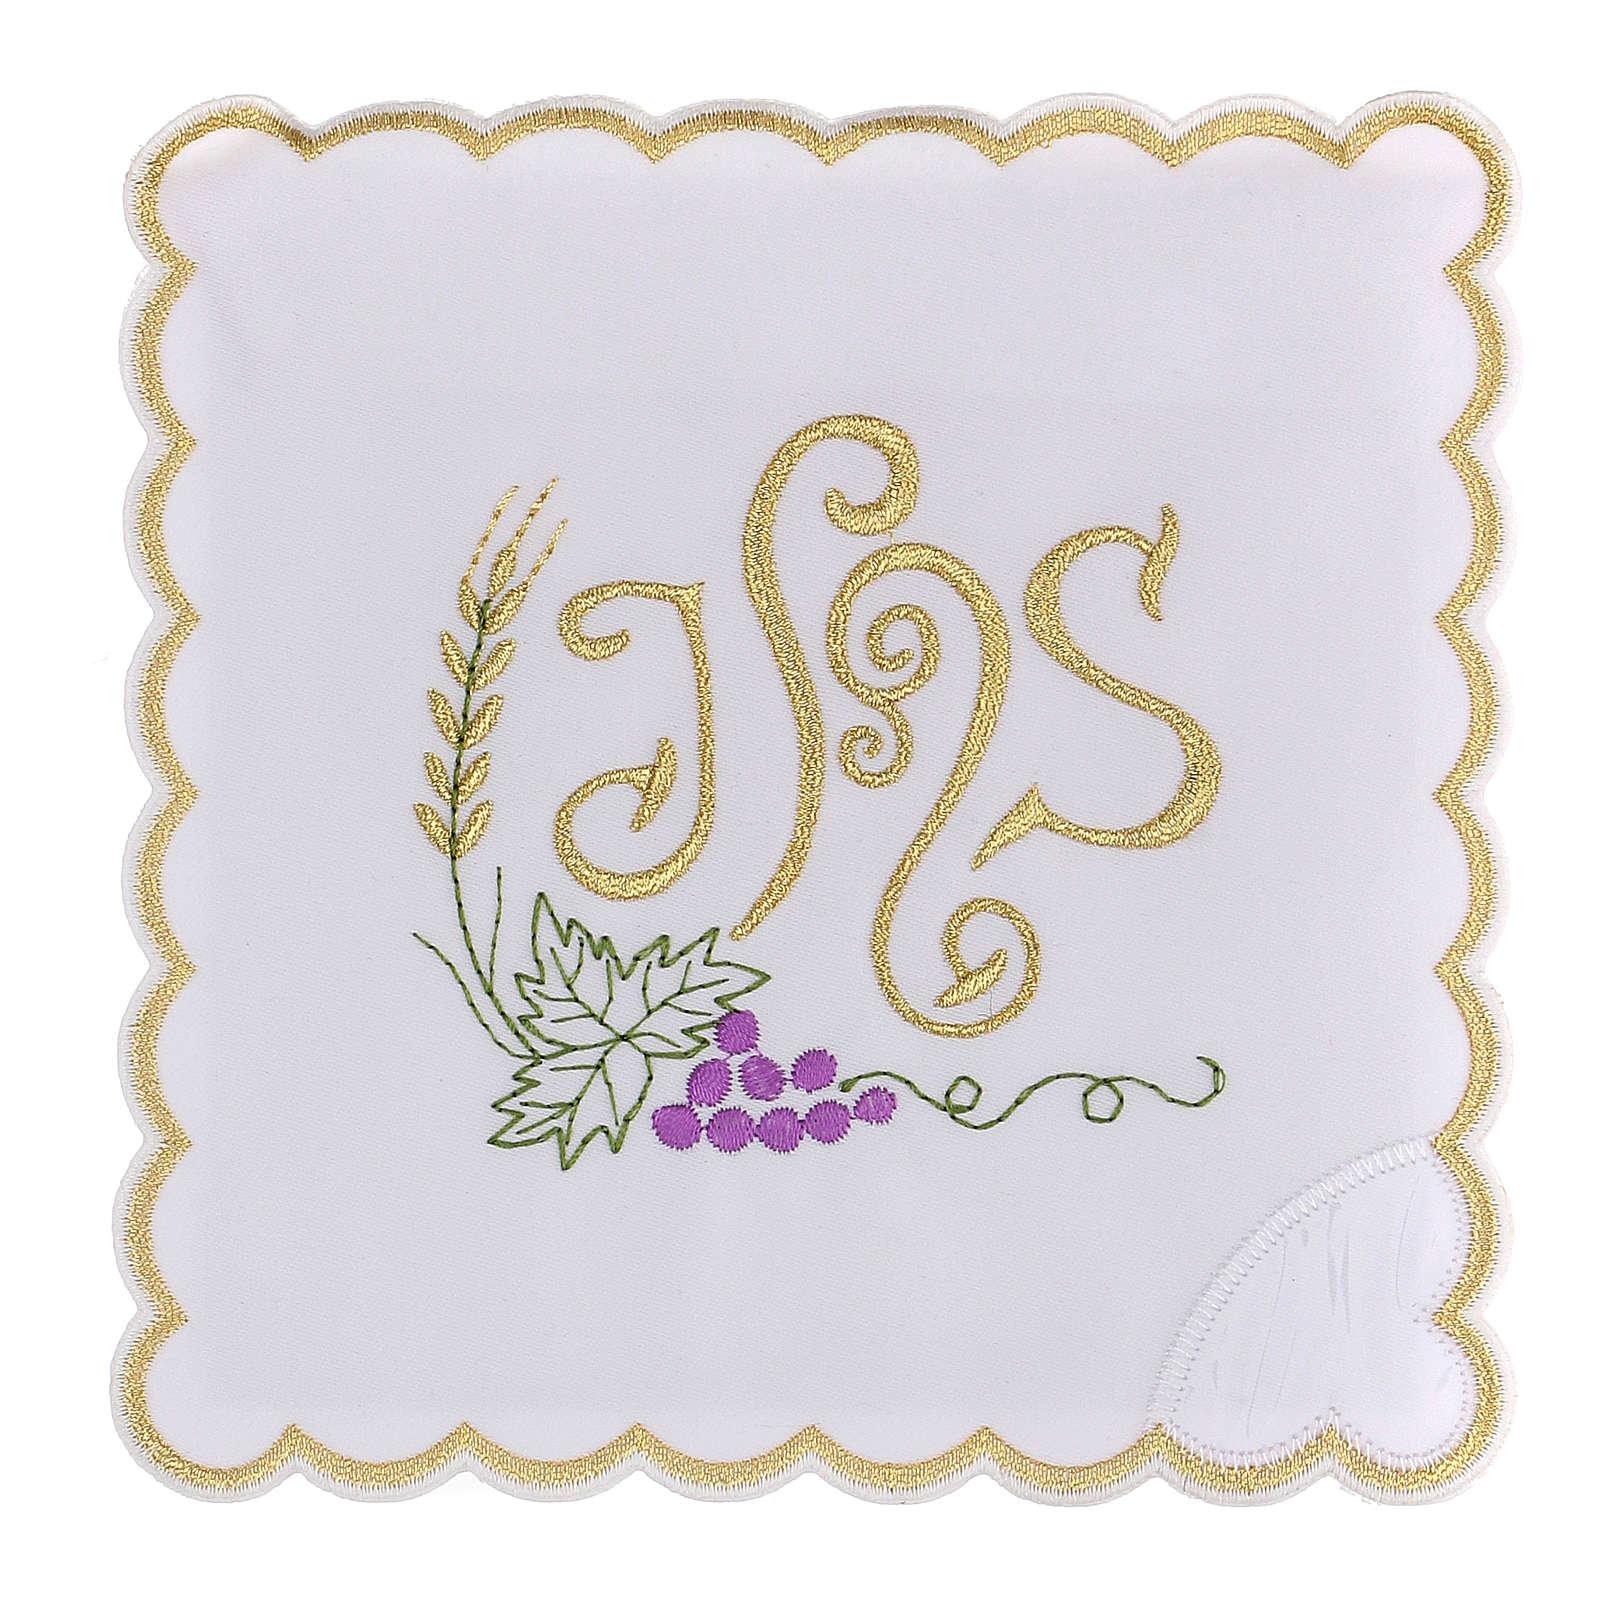 Altar linen spikes vine leaf & JHS, cotton 4